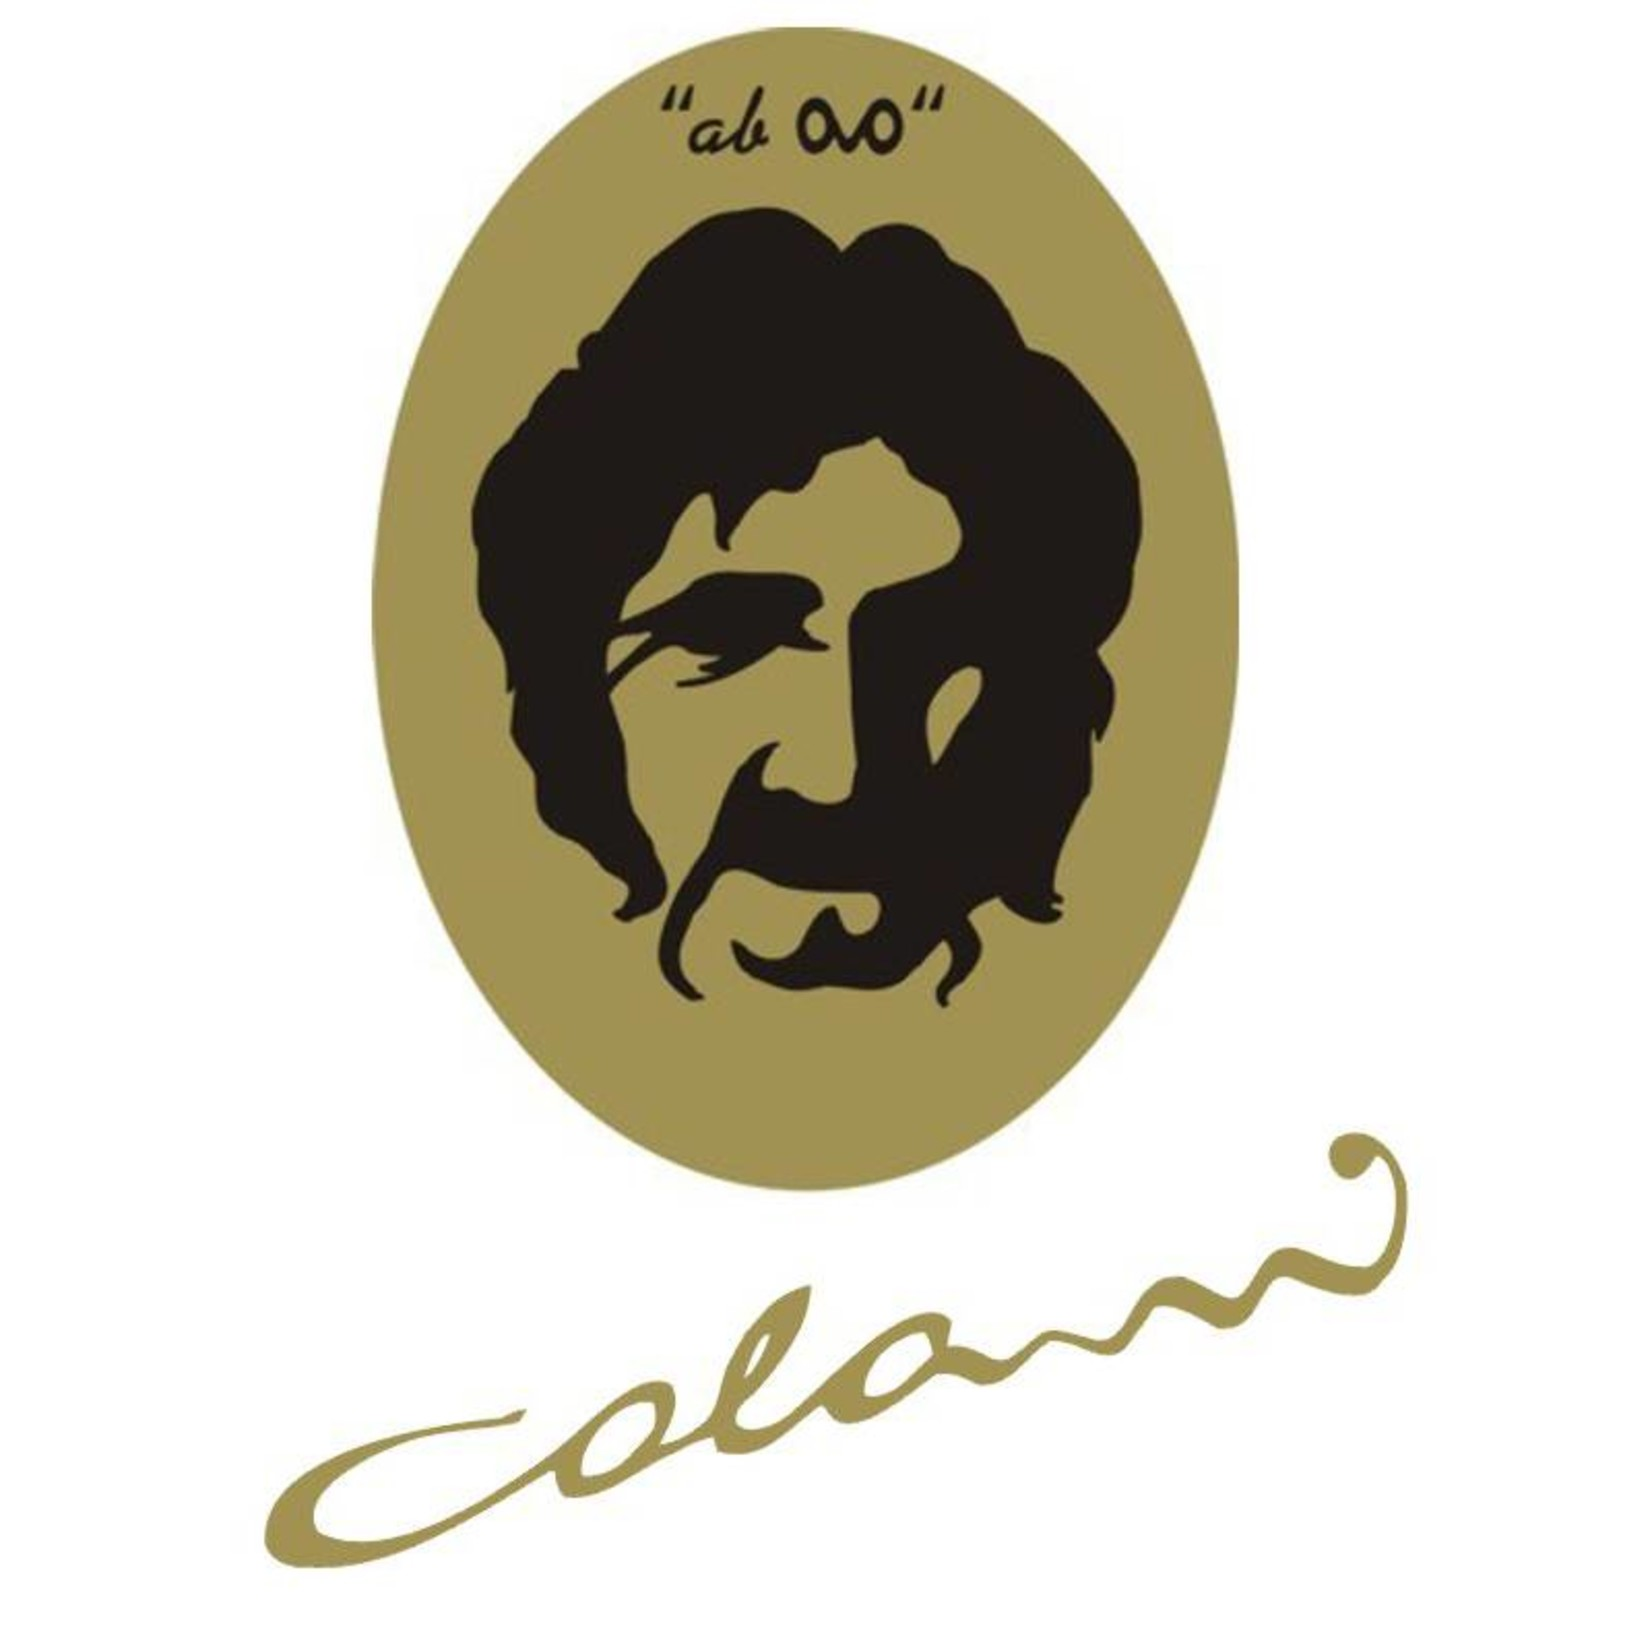 Colani Porzellanserie Colani Espressotasse, groß   Tasse inkl. Unterteller   rot